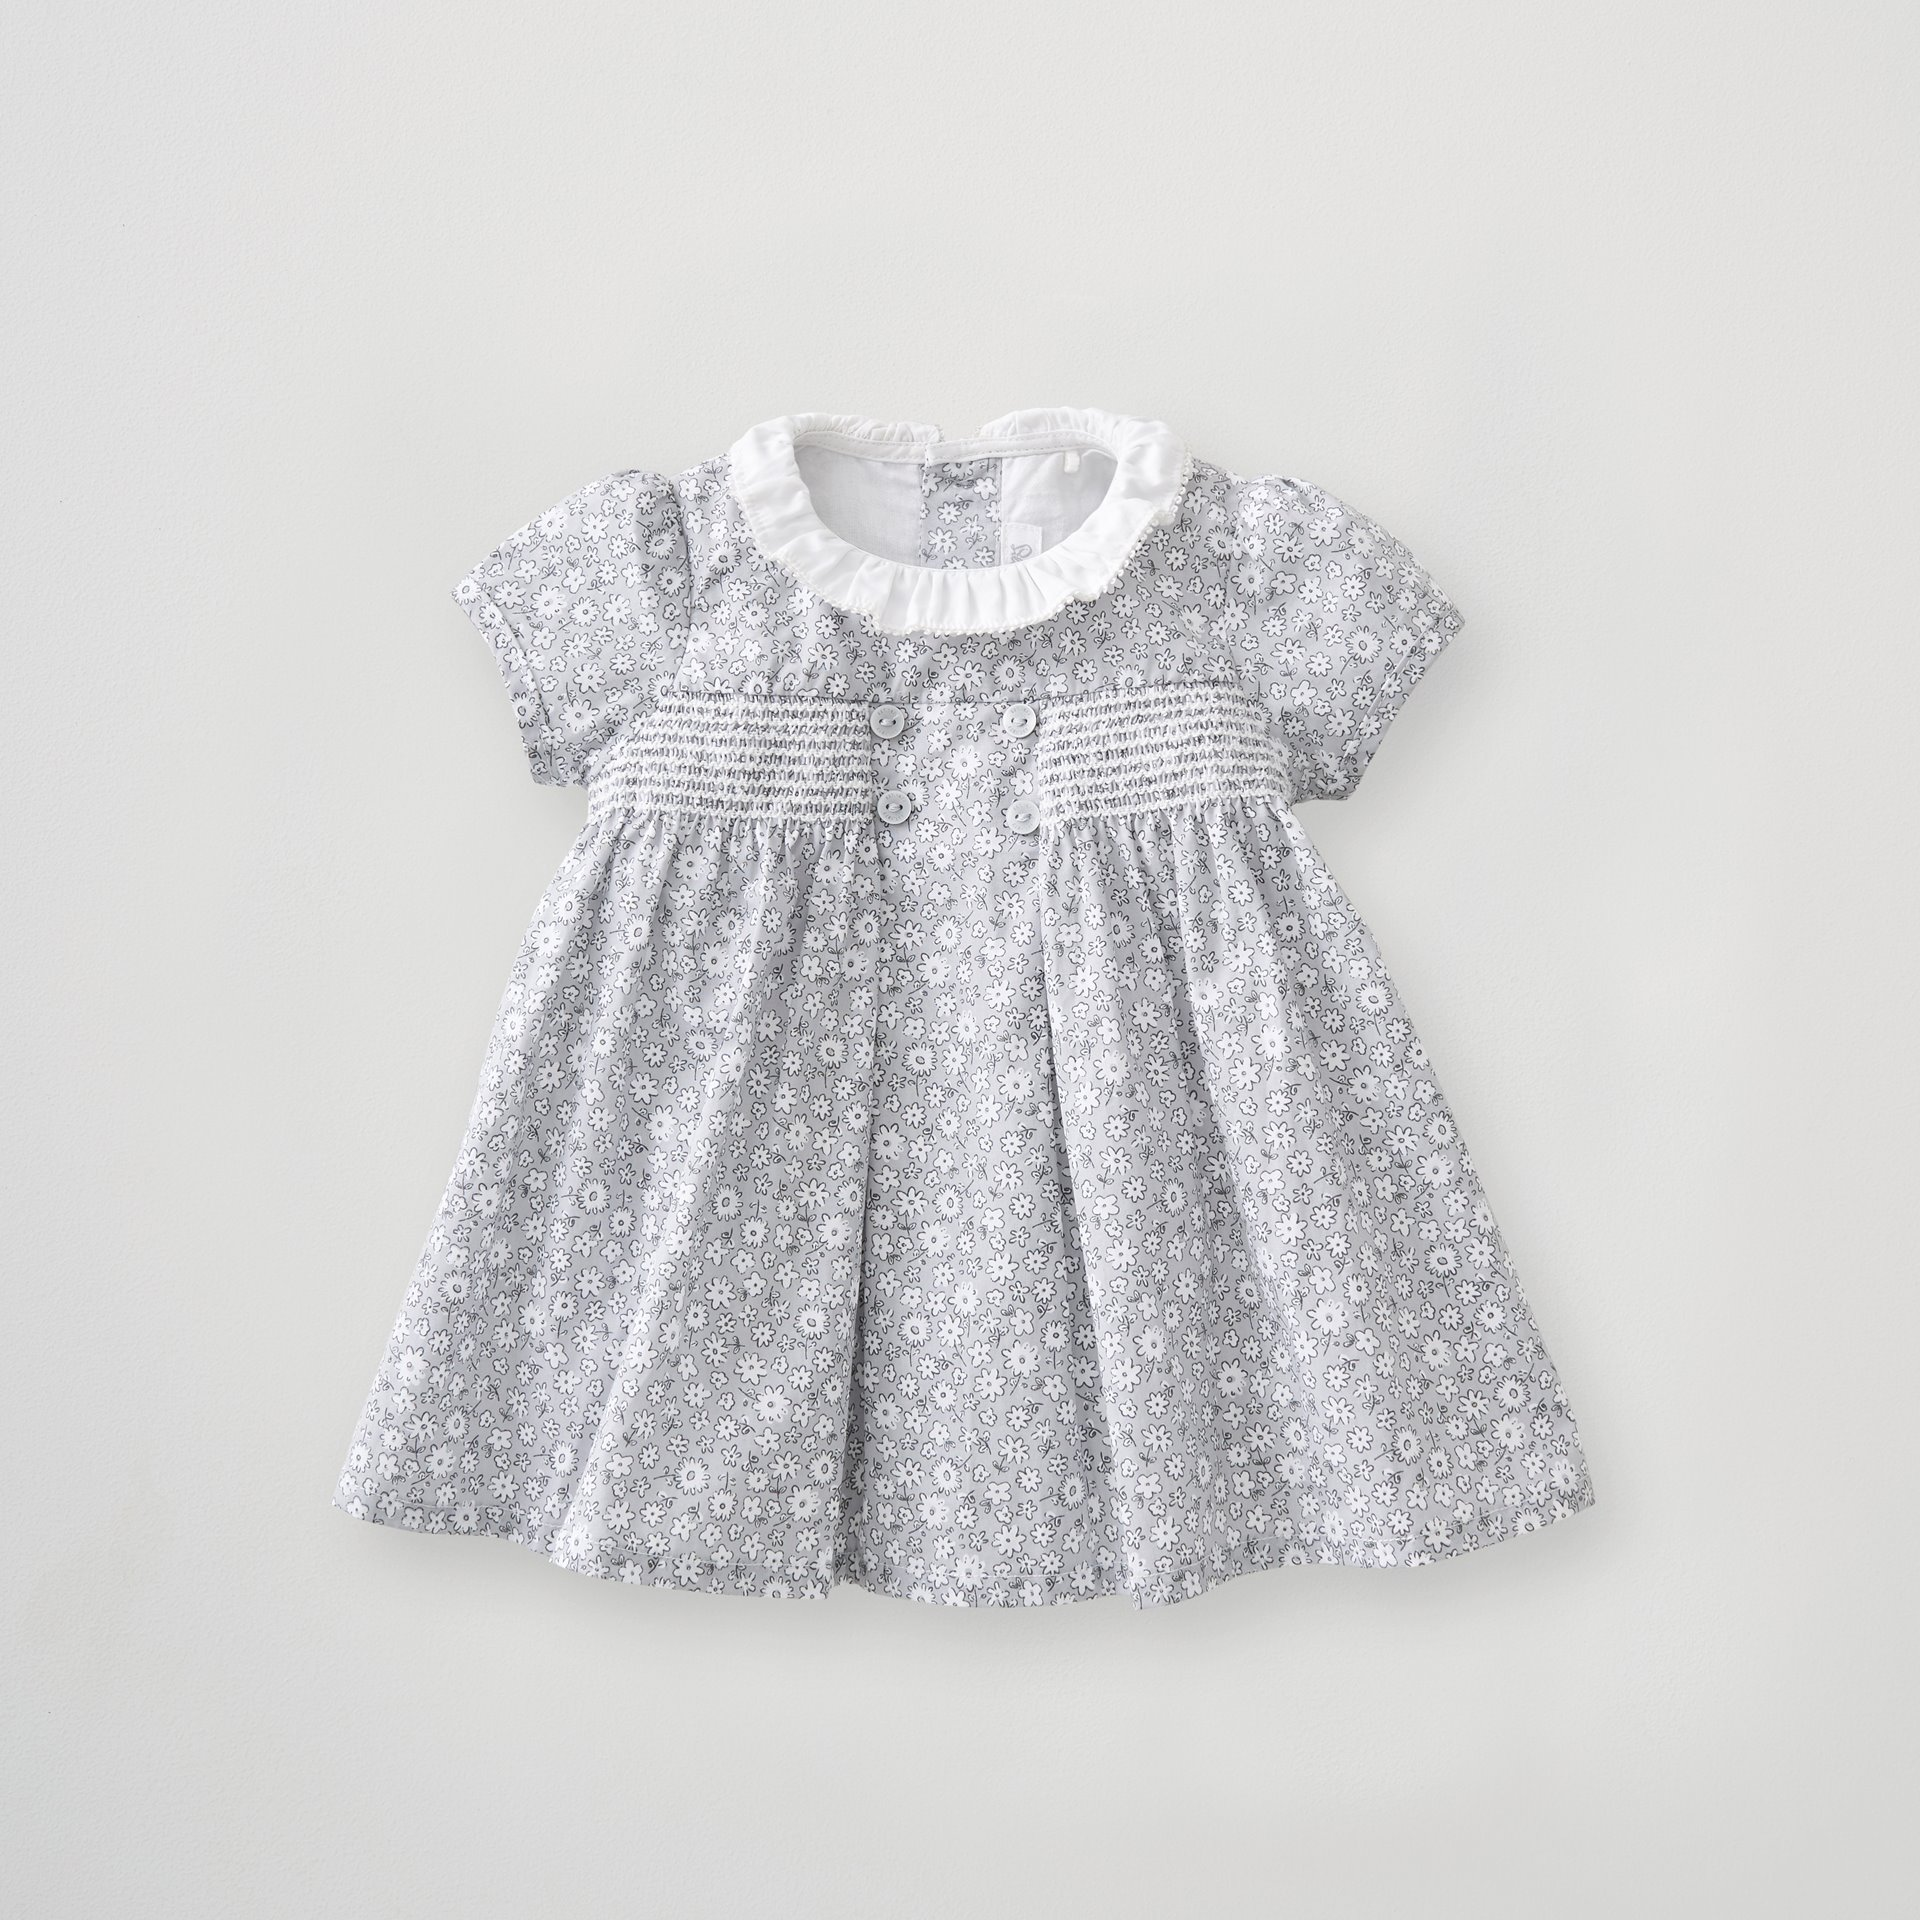 Girls Floral Smock Button Dress 0-3 Months